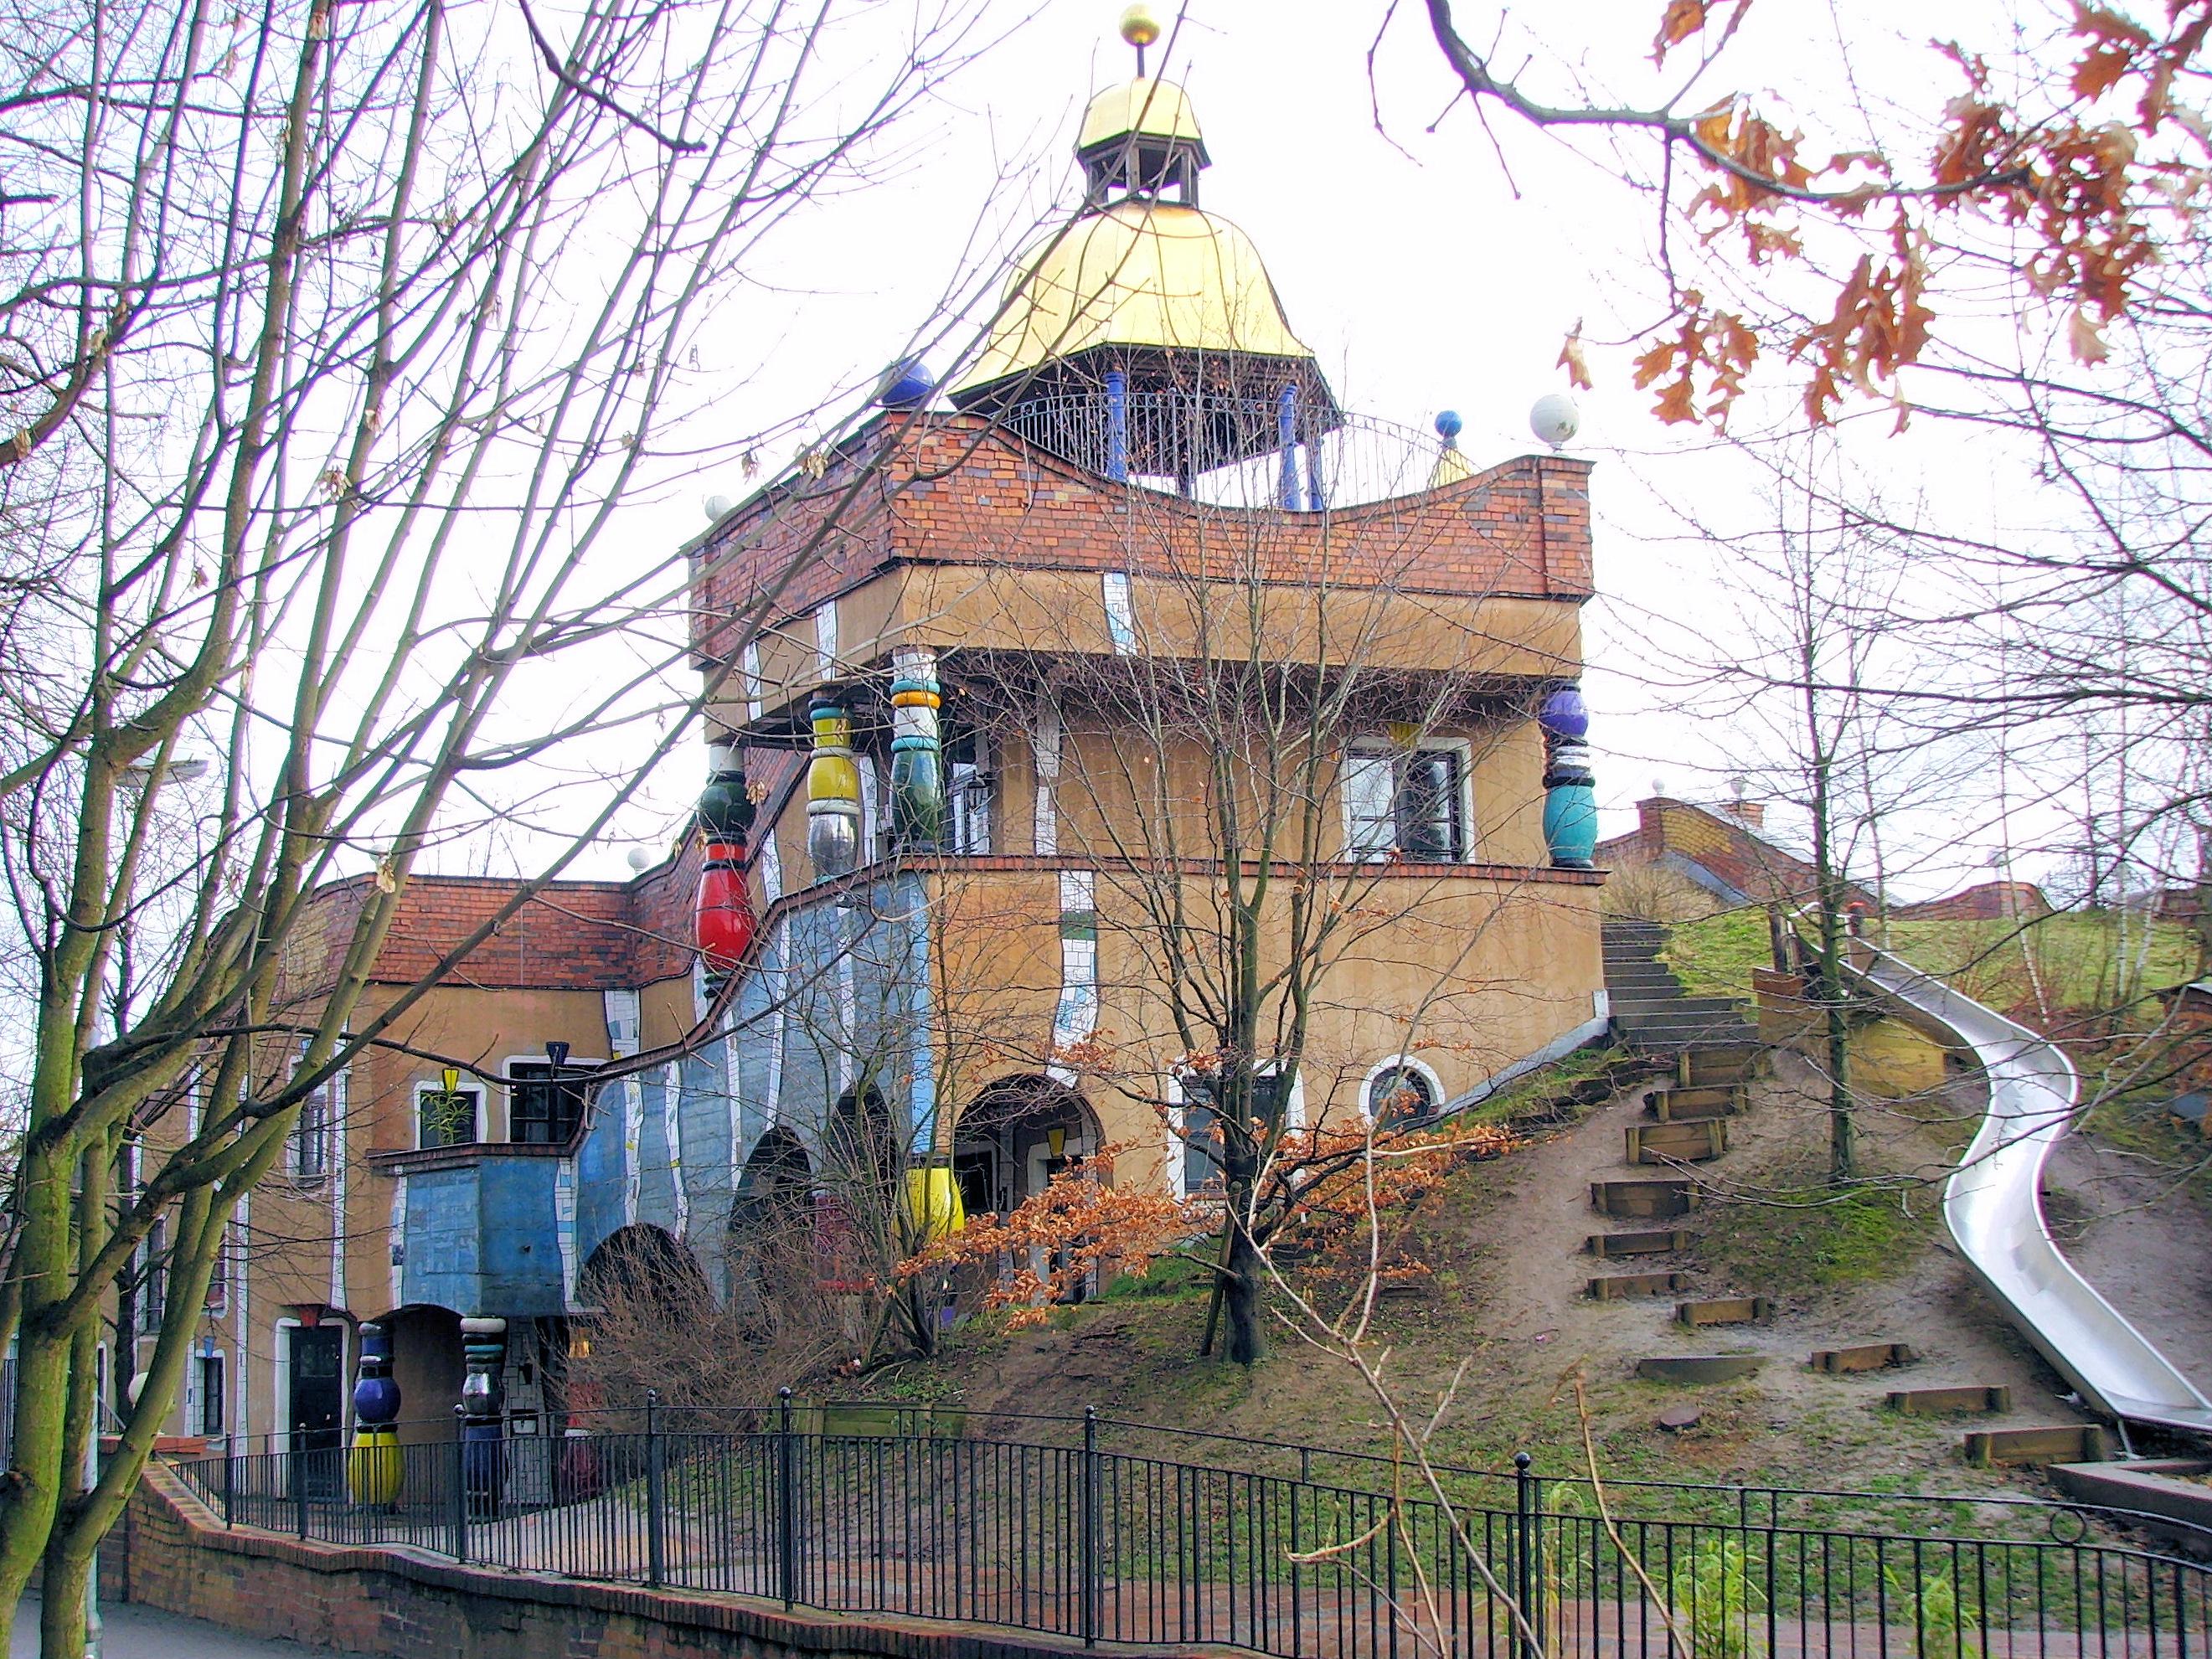 Hundertwasser Kindergarten